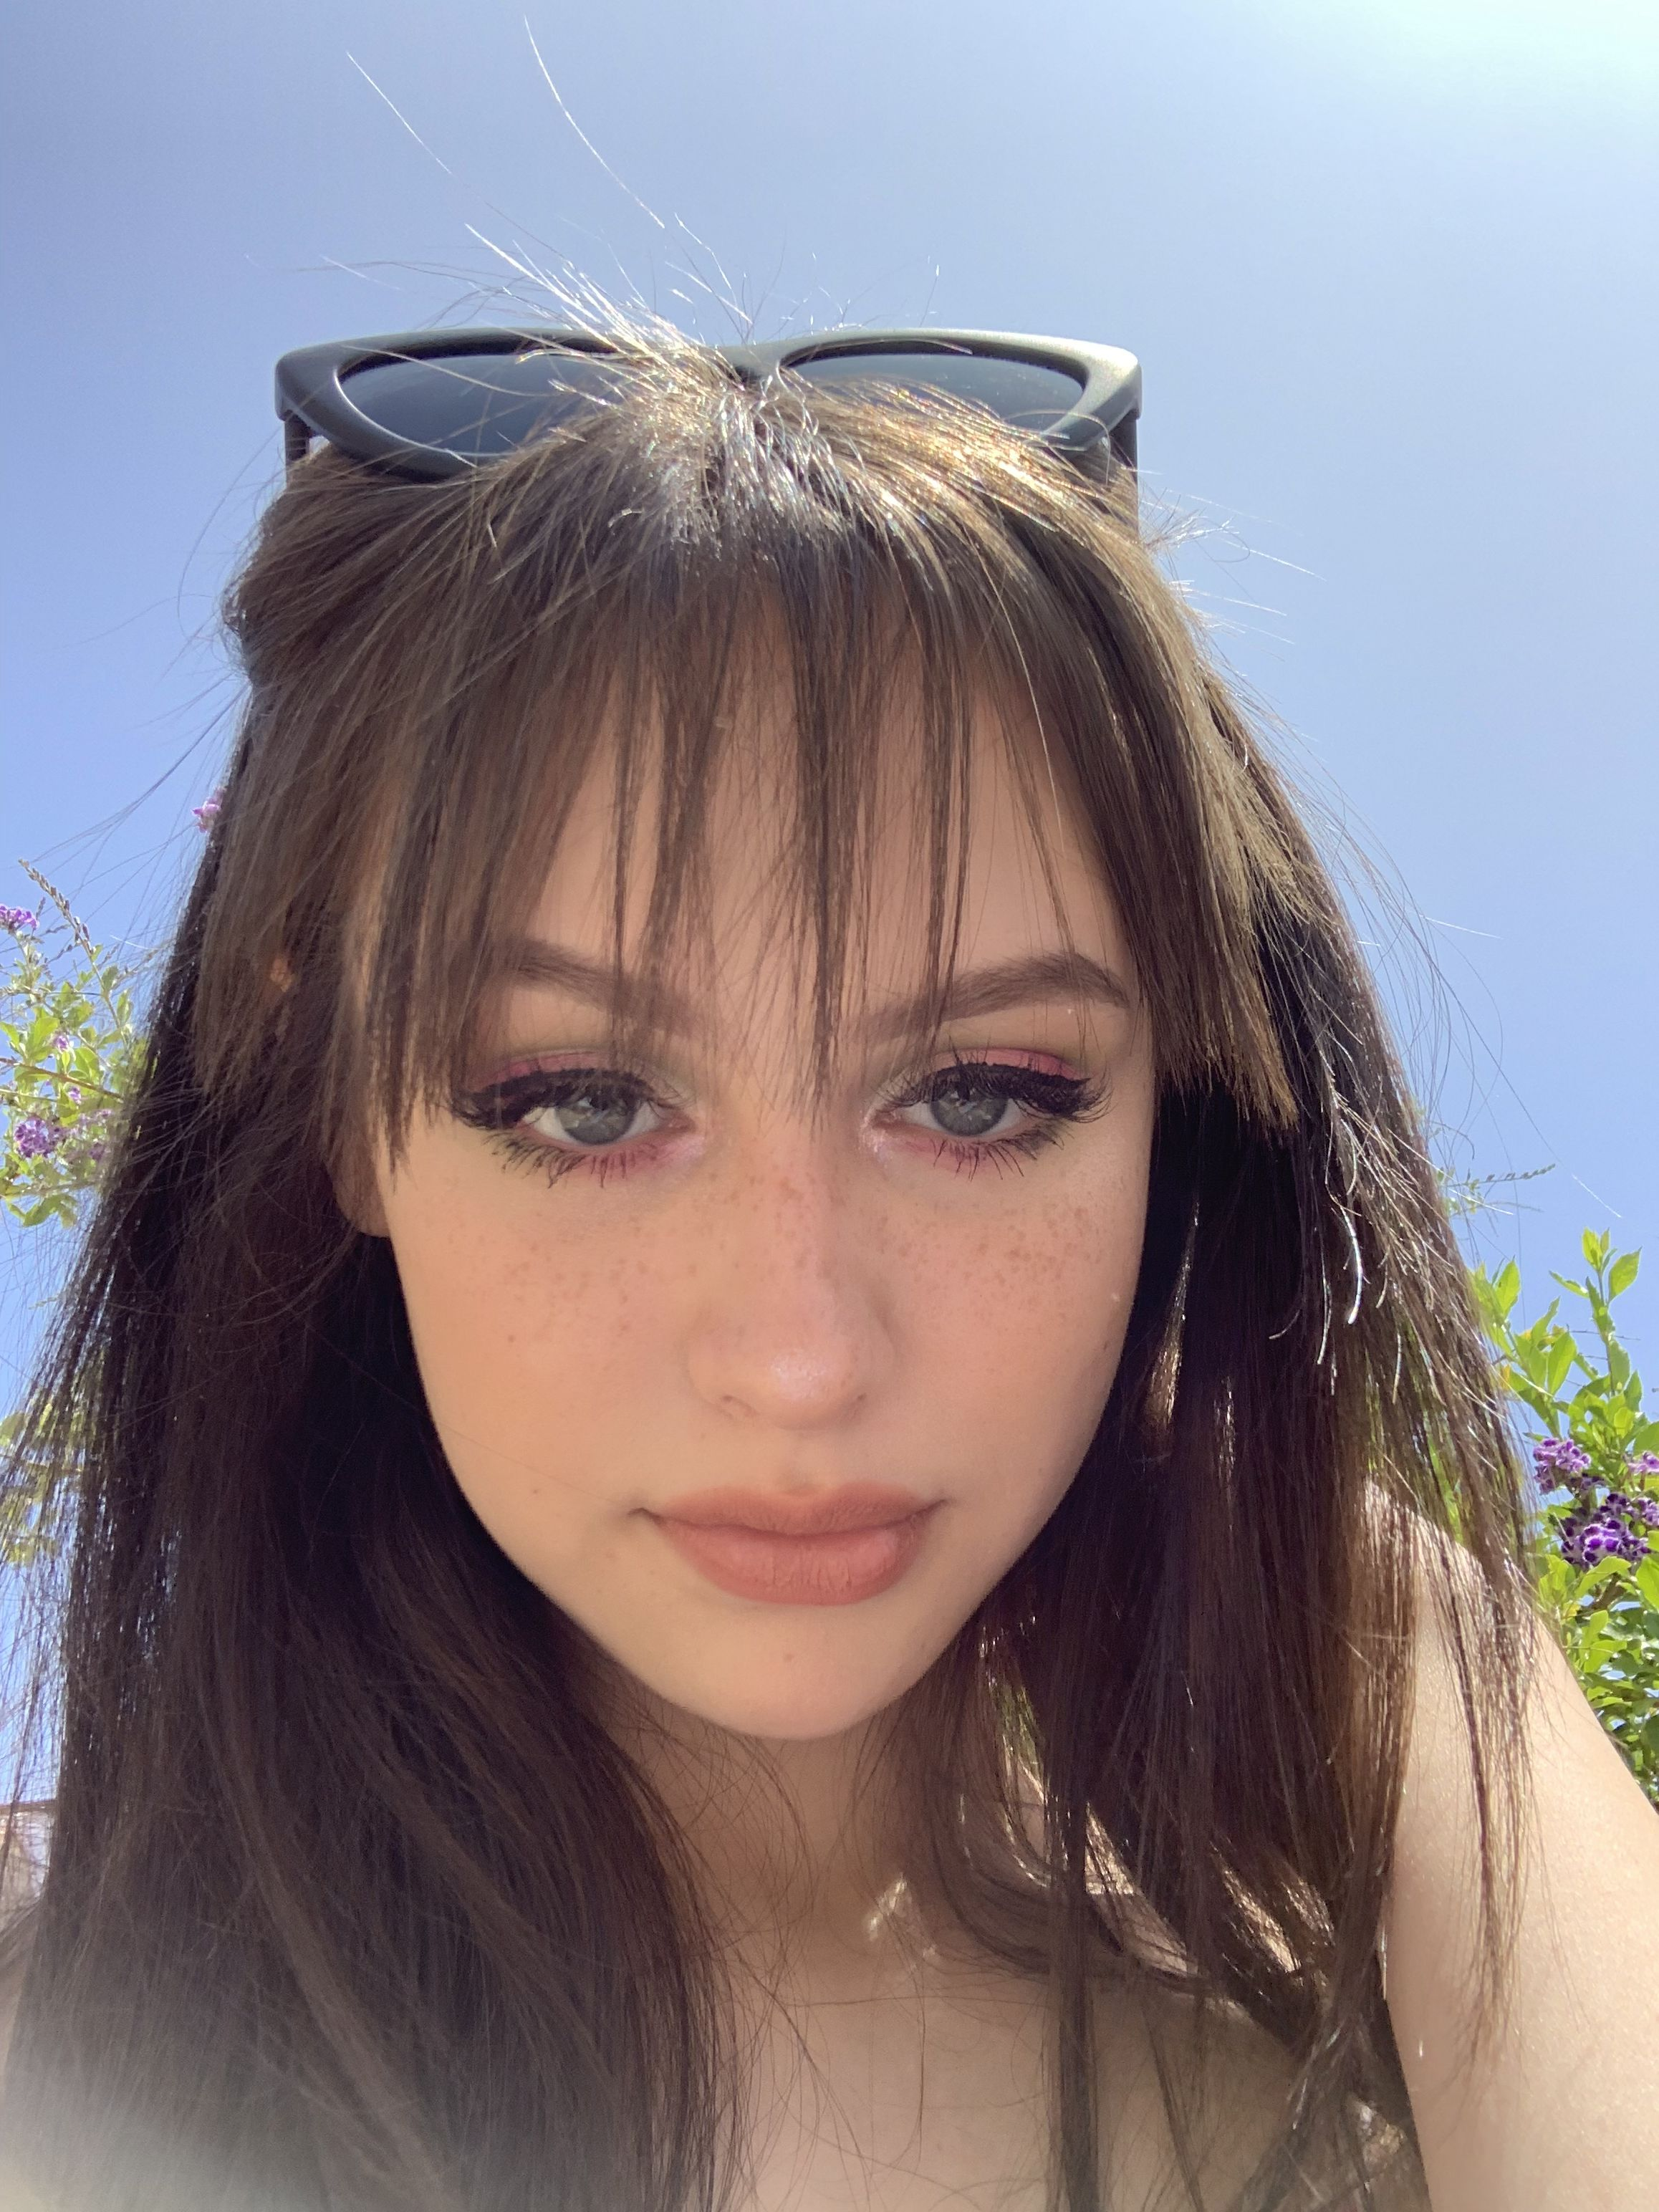 Photo of sunglasses Haley morales